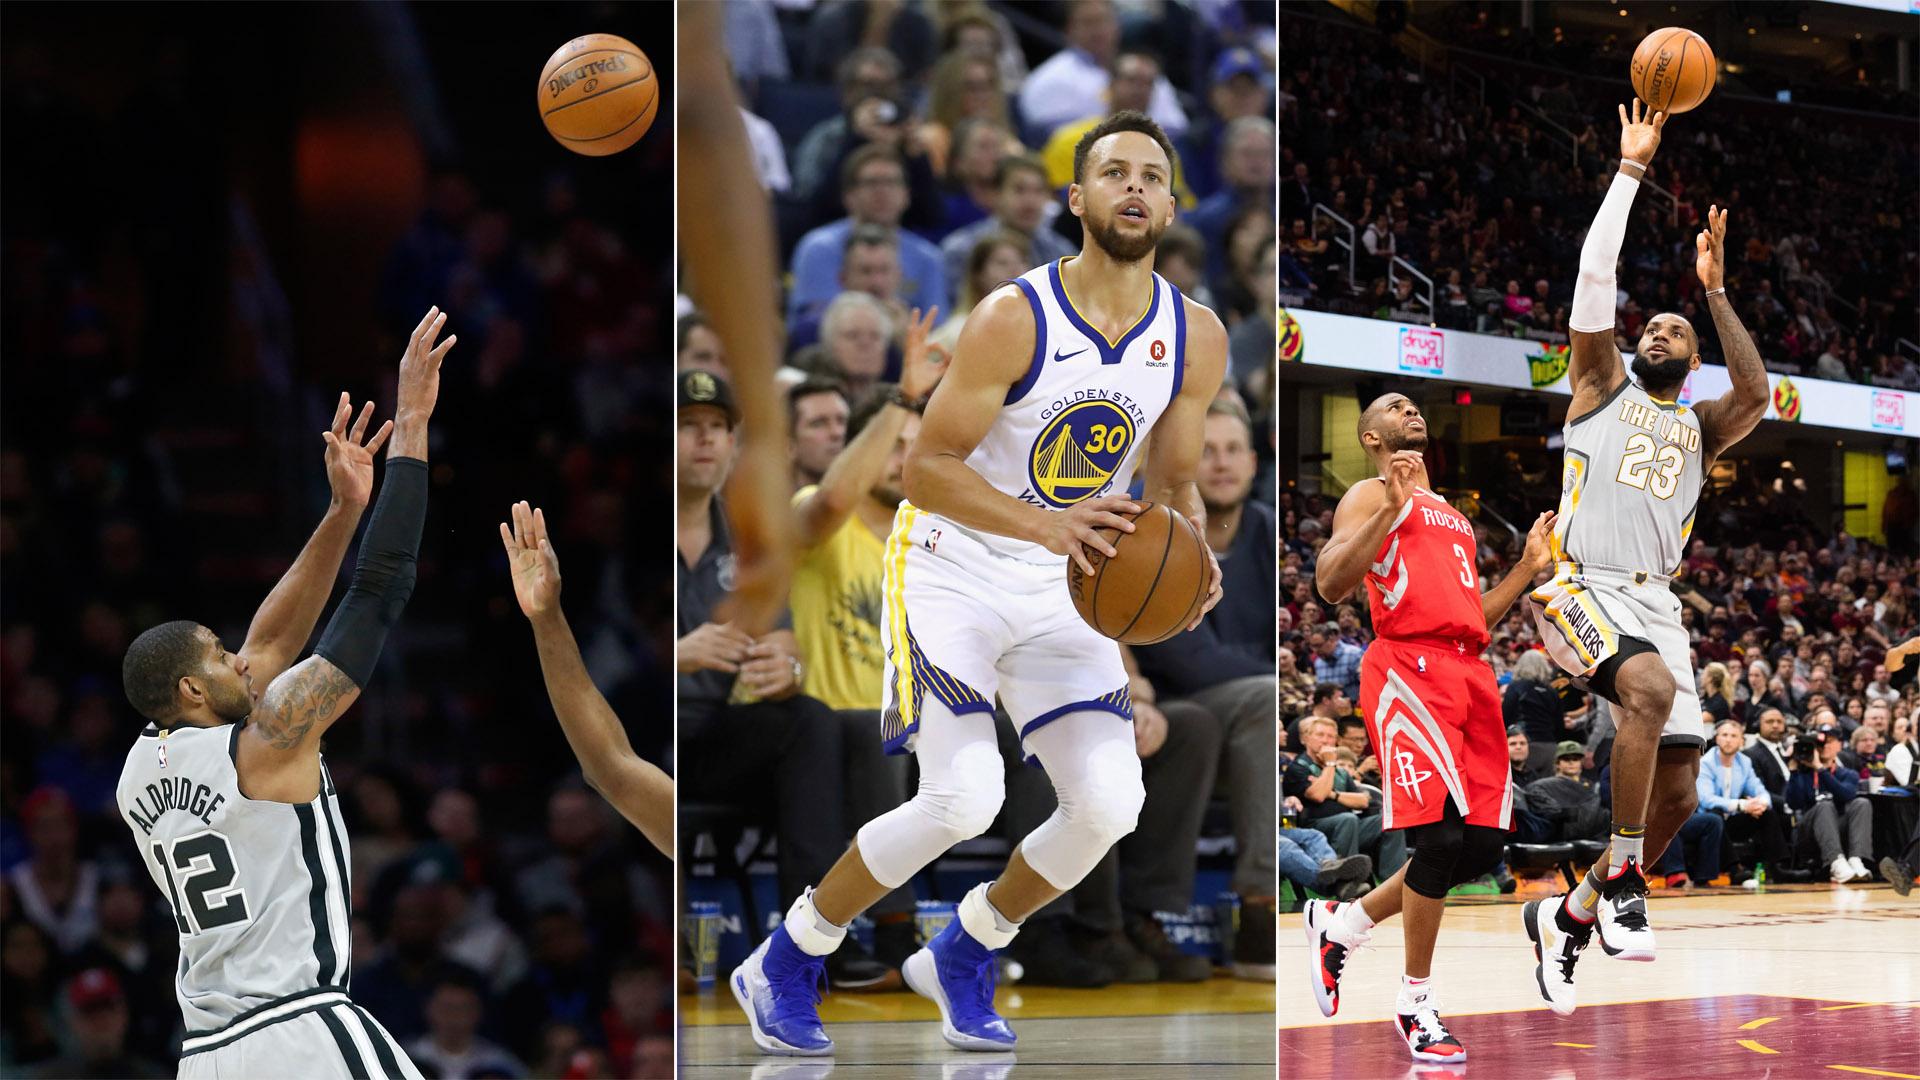 LaMarcus Aldridge, Stephen Curry and LeBron James